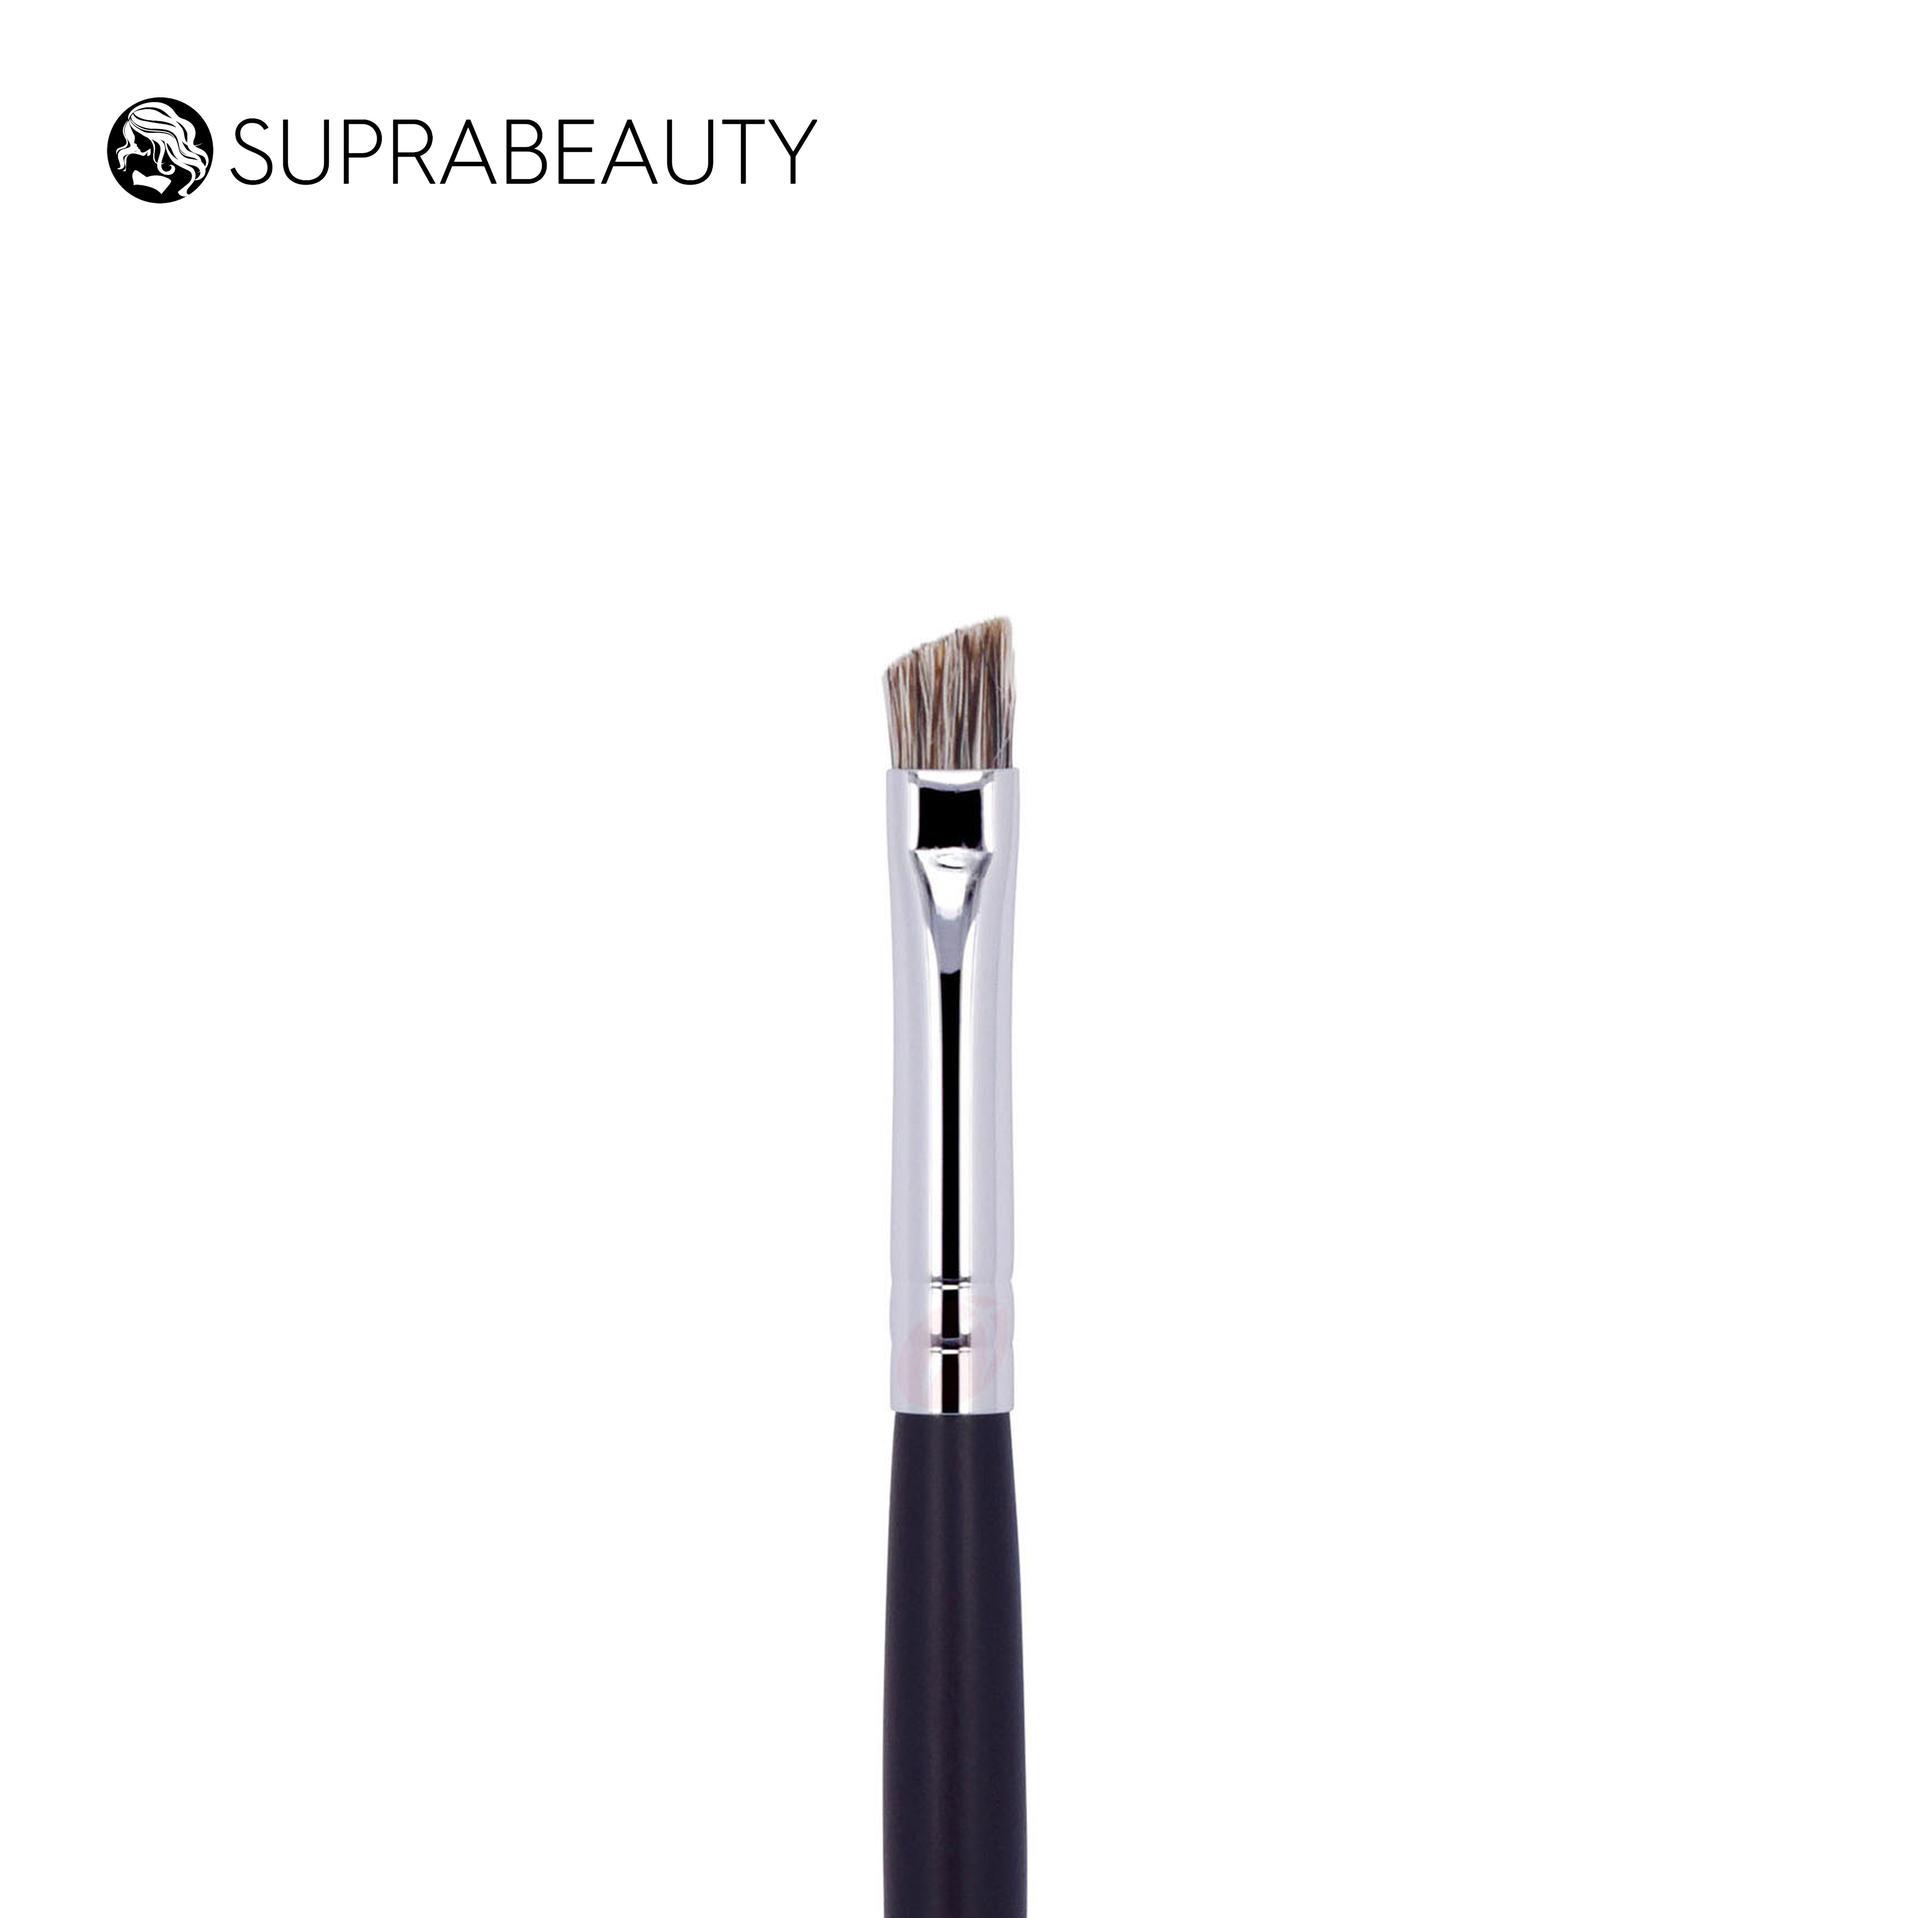 Disposable Eyelash Mascara Wand Double End Cosmetic Spoolie Brush Custom BrandMakeup Eyebrow Brush